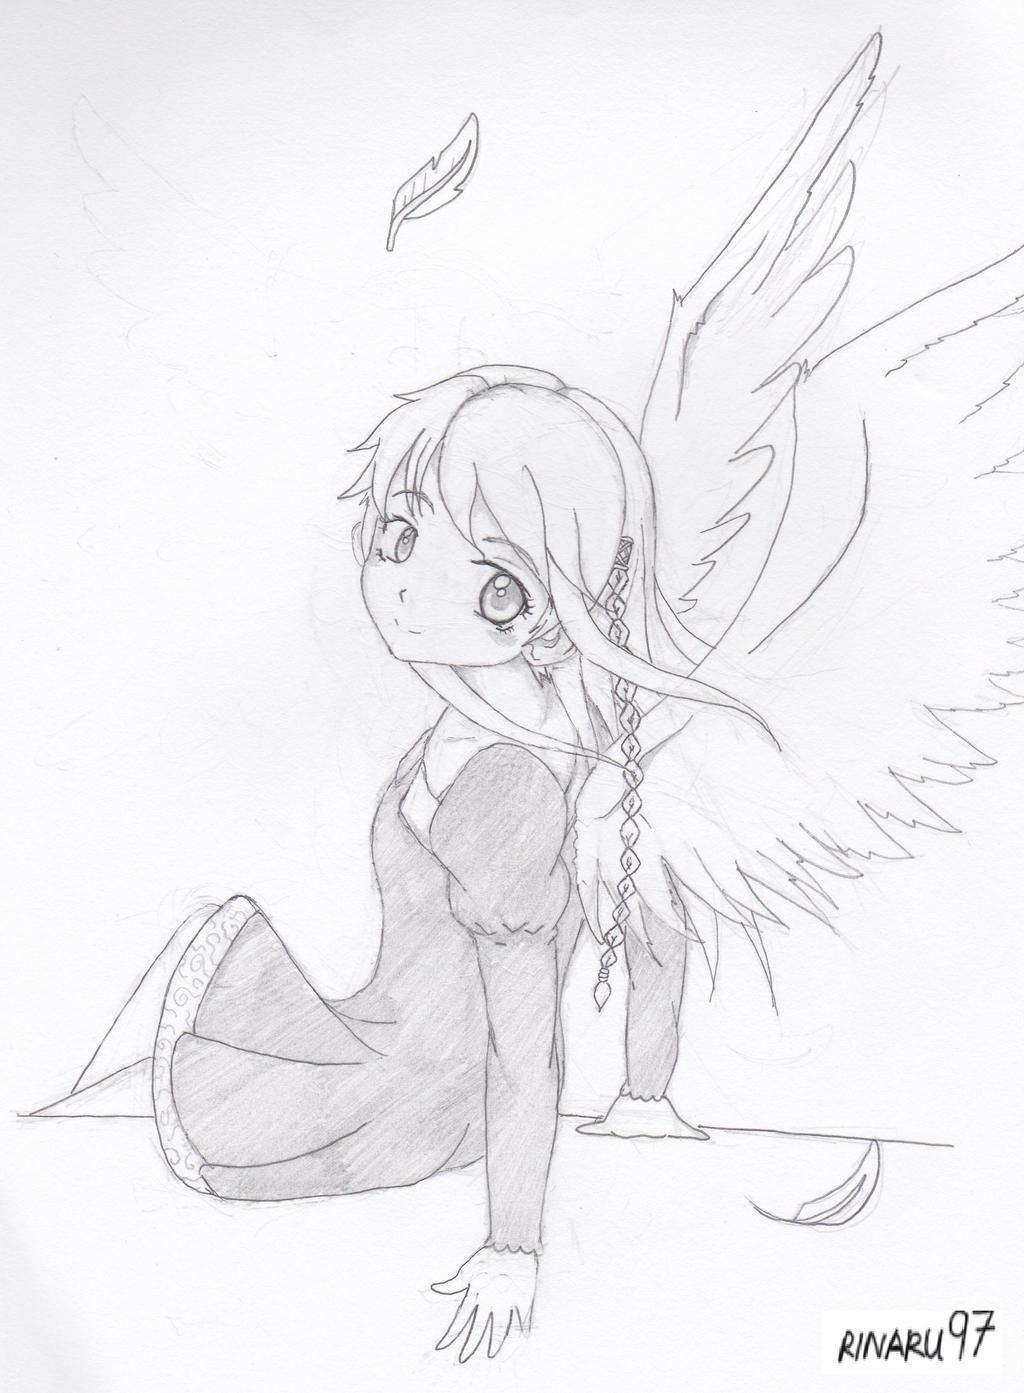 Anime Girl With Wings (Akiyama Naomi 1) By RiNaru97 On DeviantArt